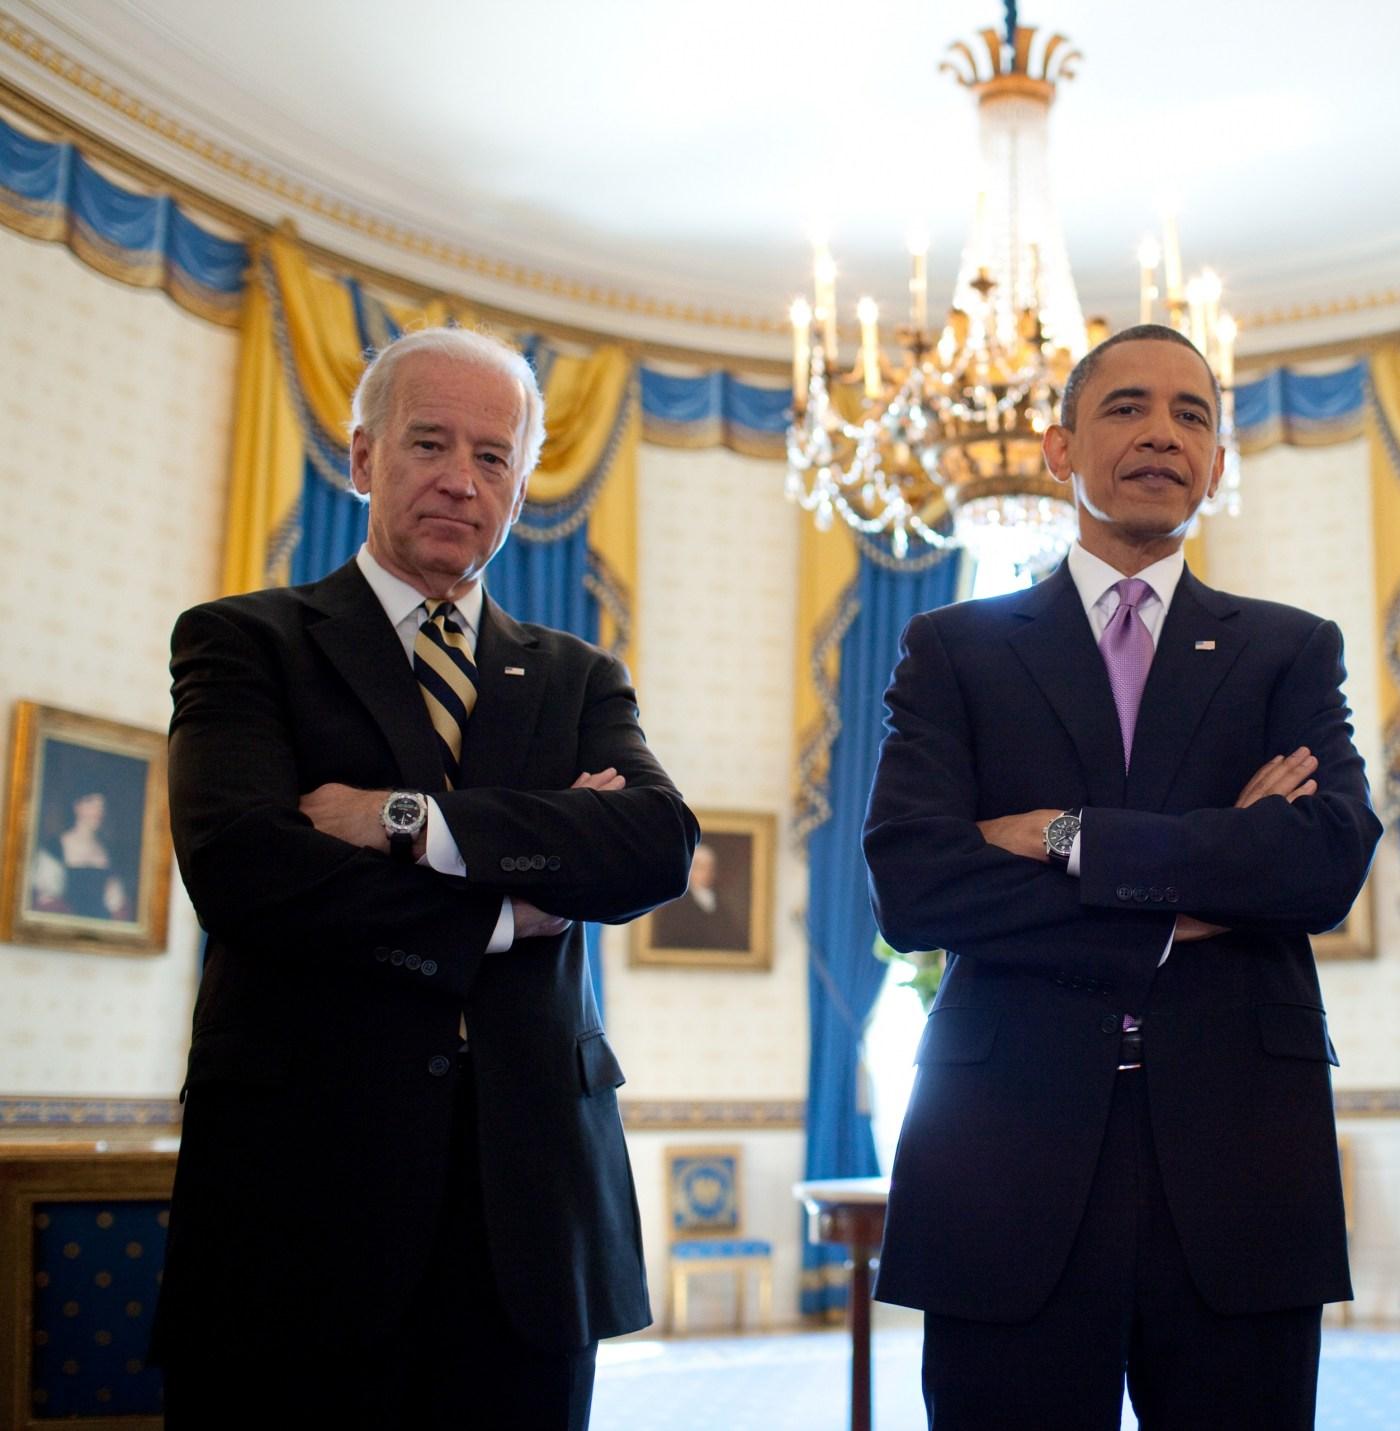 Vice President Biden wearing Tissot T-Touch President Obama wearing Jorg Gray chronograph